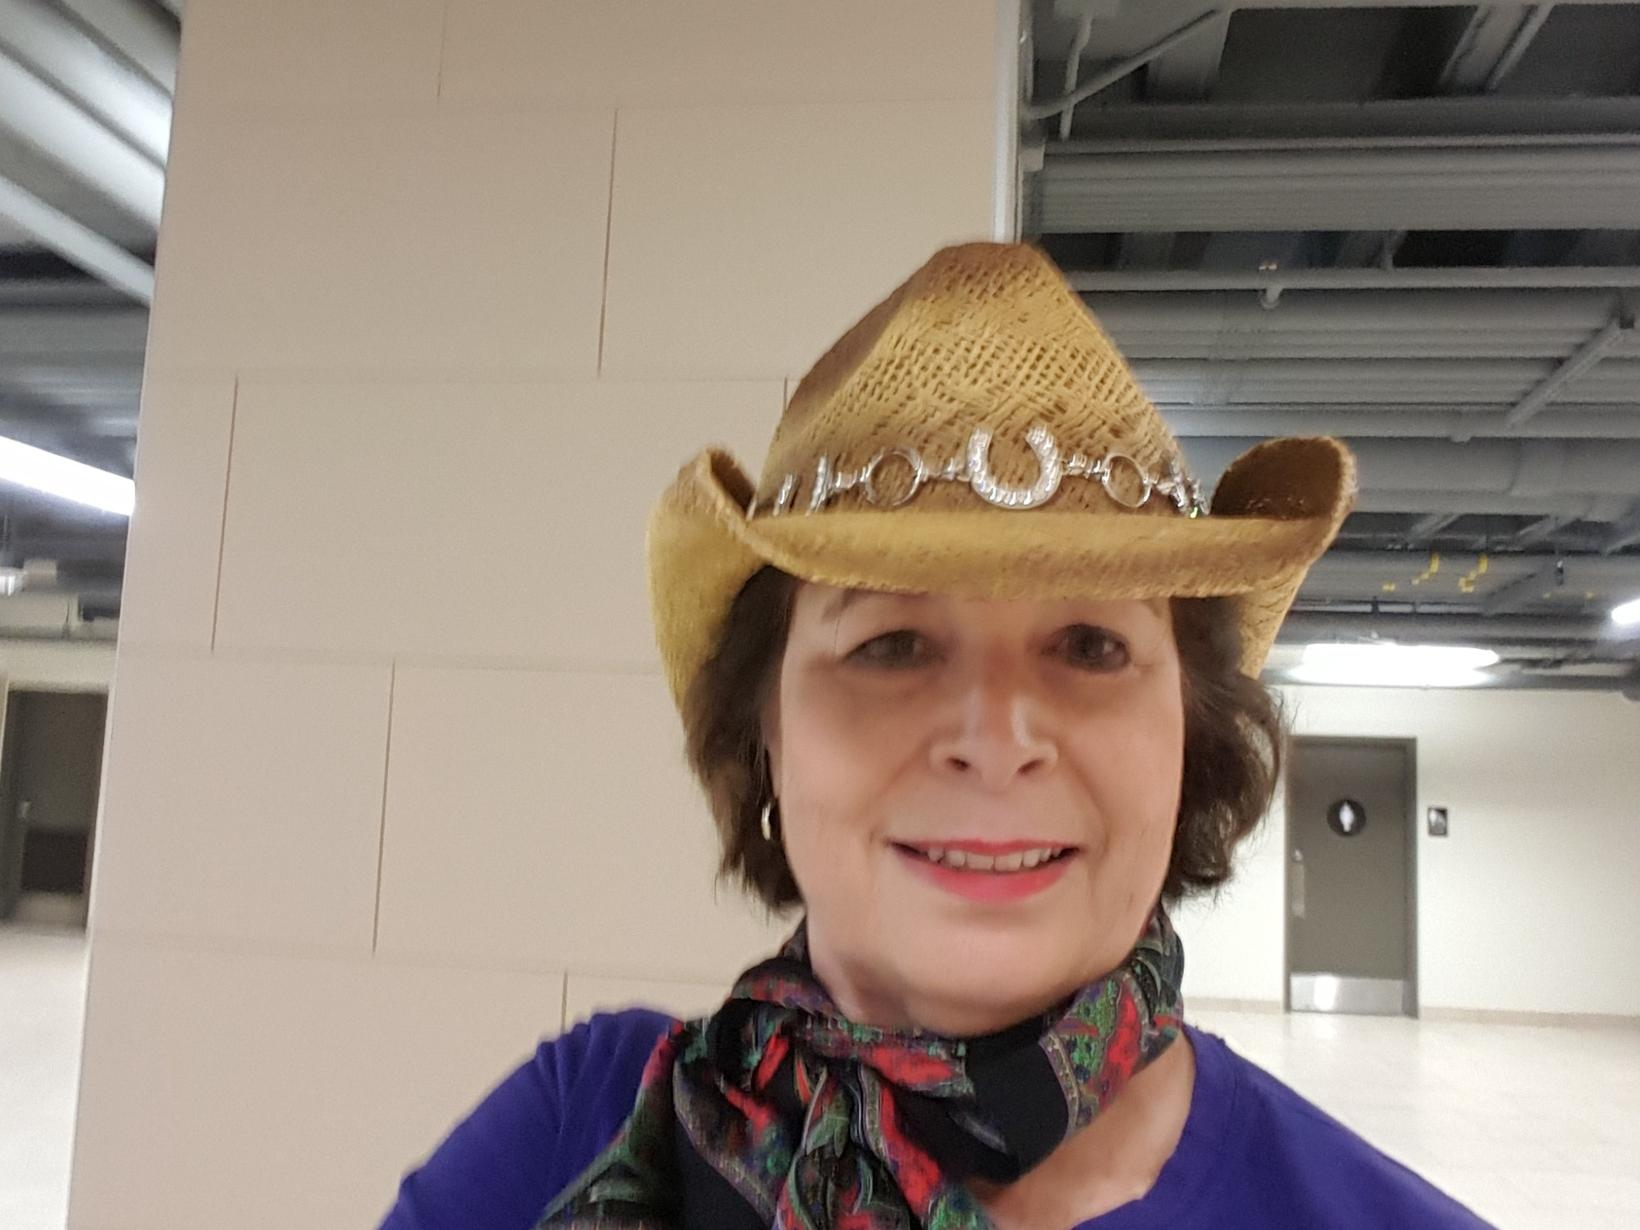 Cheryl from Severna Park, Maryland, United States